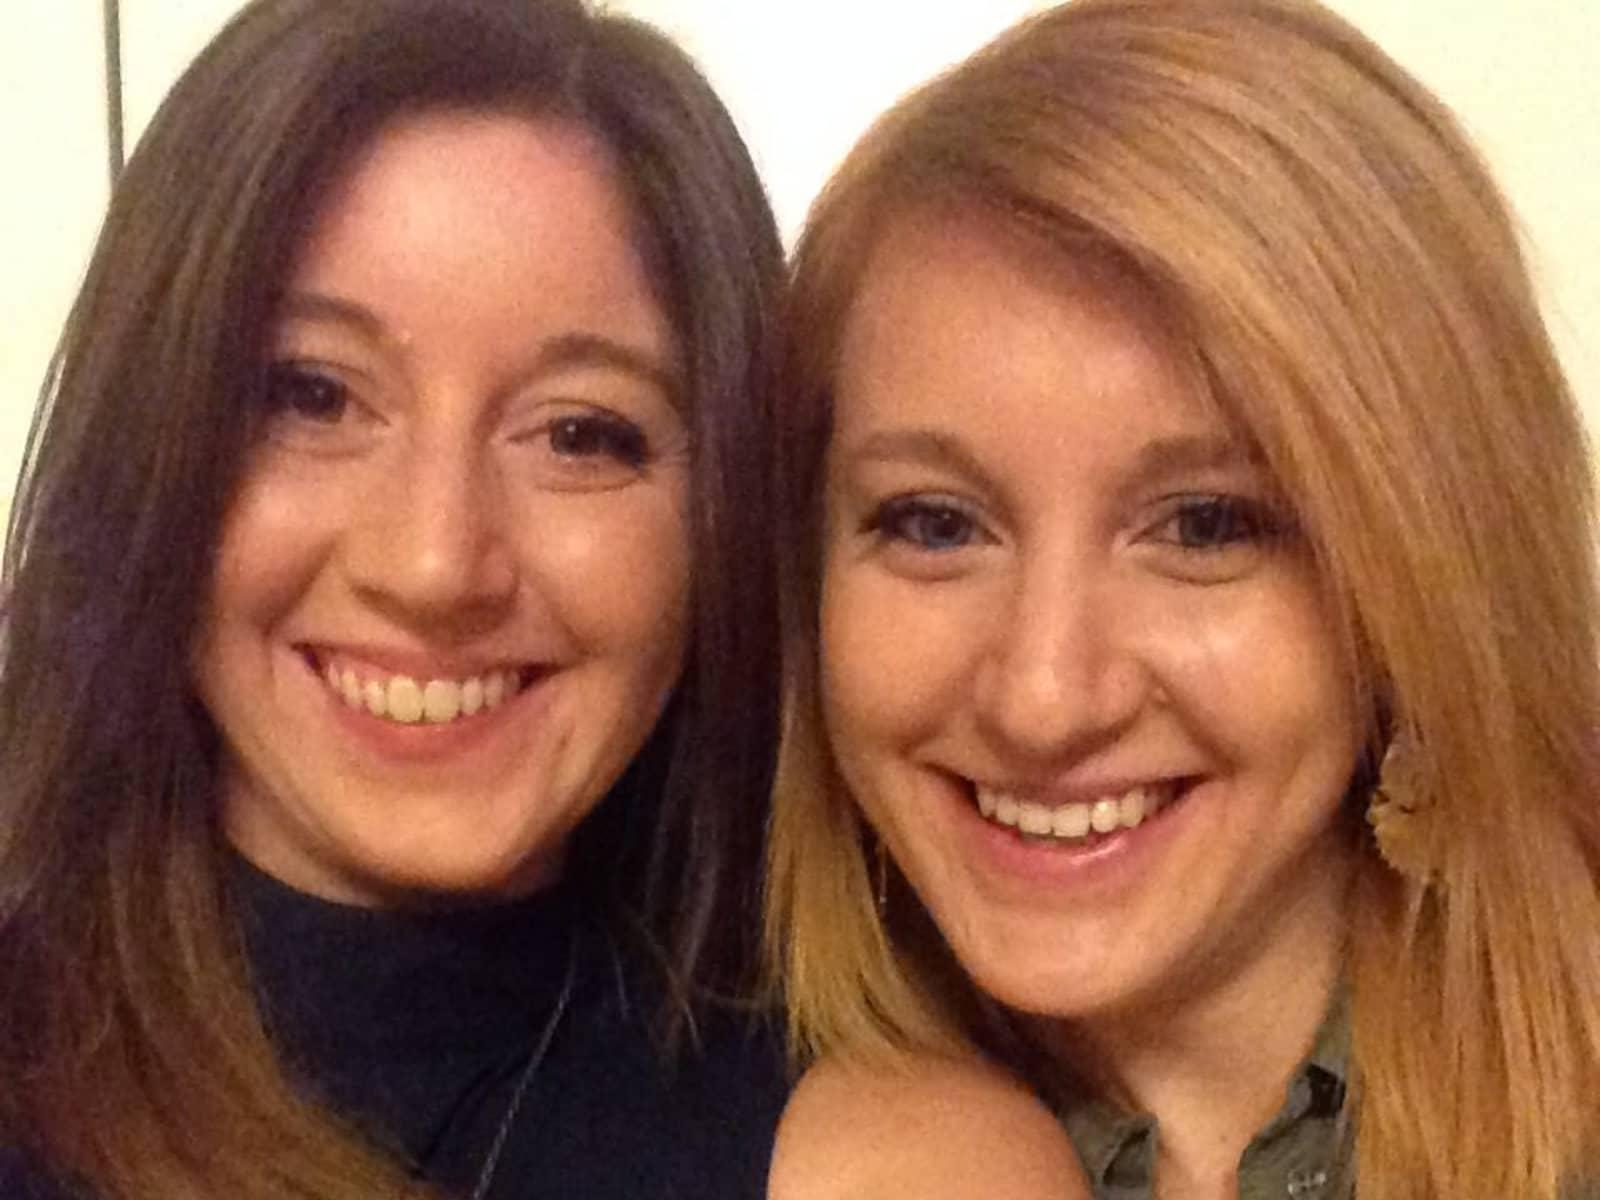 Marlene & Susanne from Graz, Austria